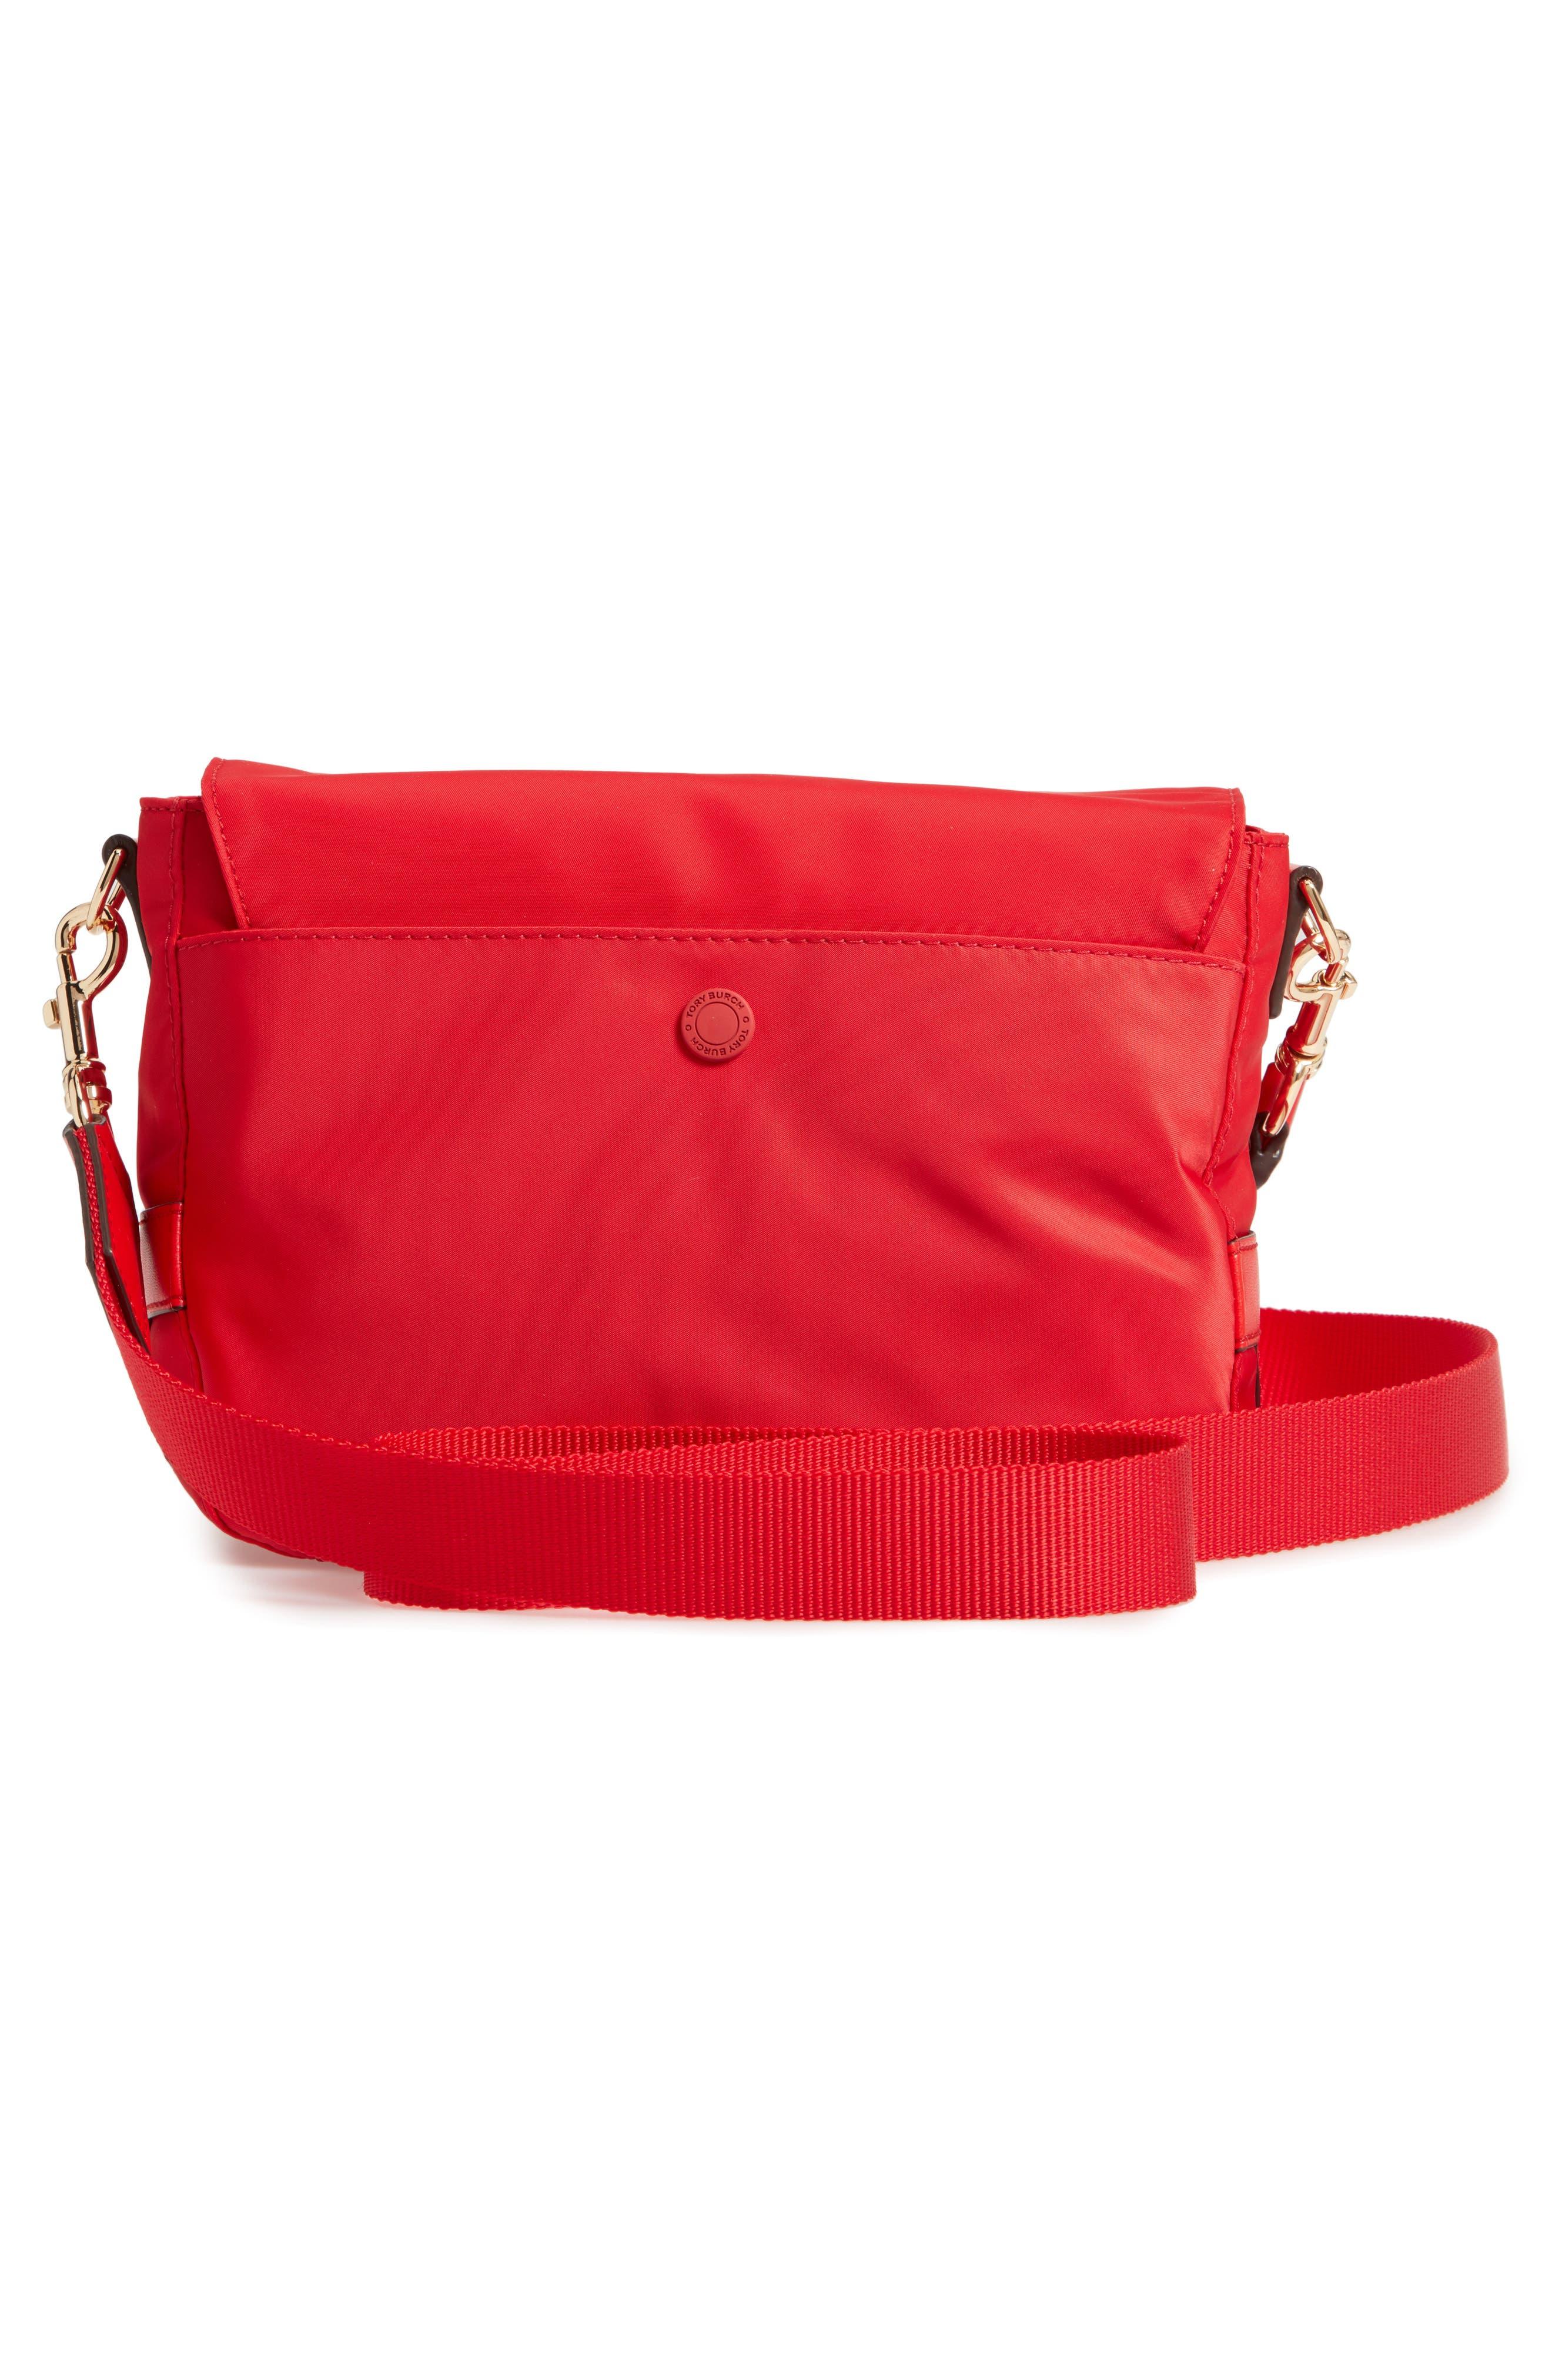 Tilda Nylon Crossbody Bag,                             Alternate thumbnail 4, color,                             BRILLIANT RED